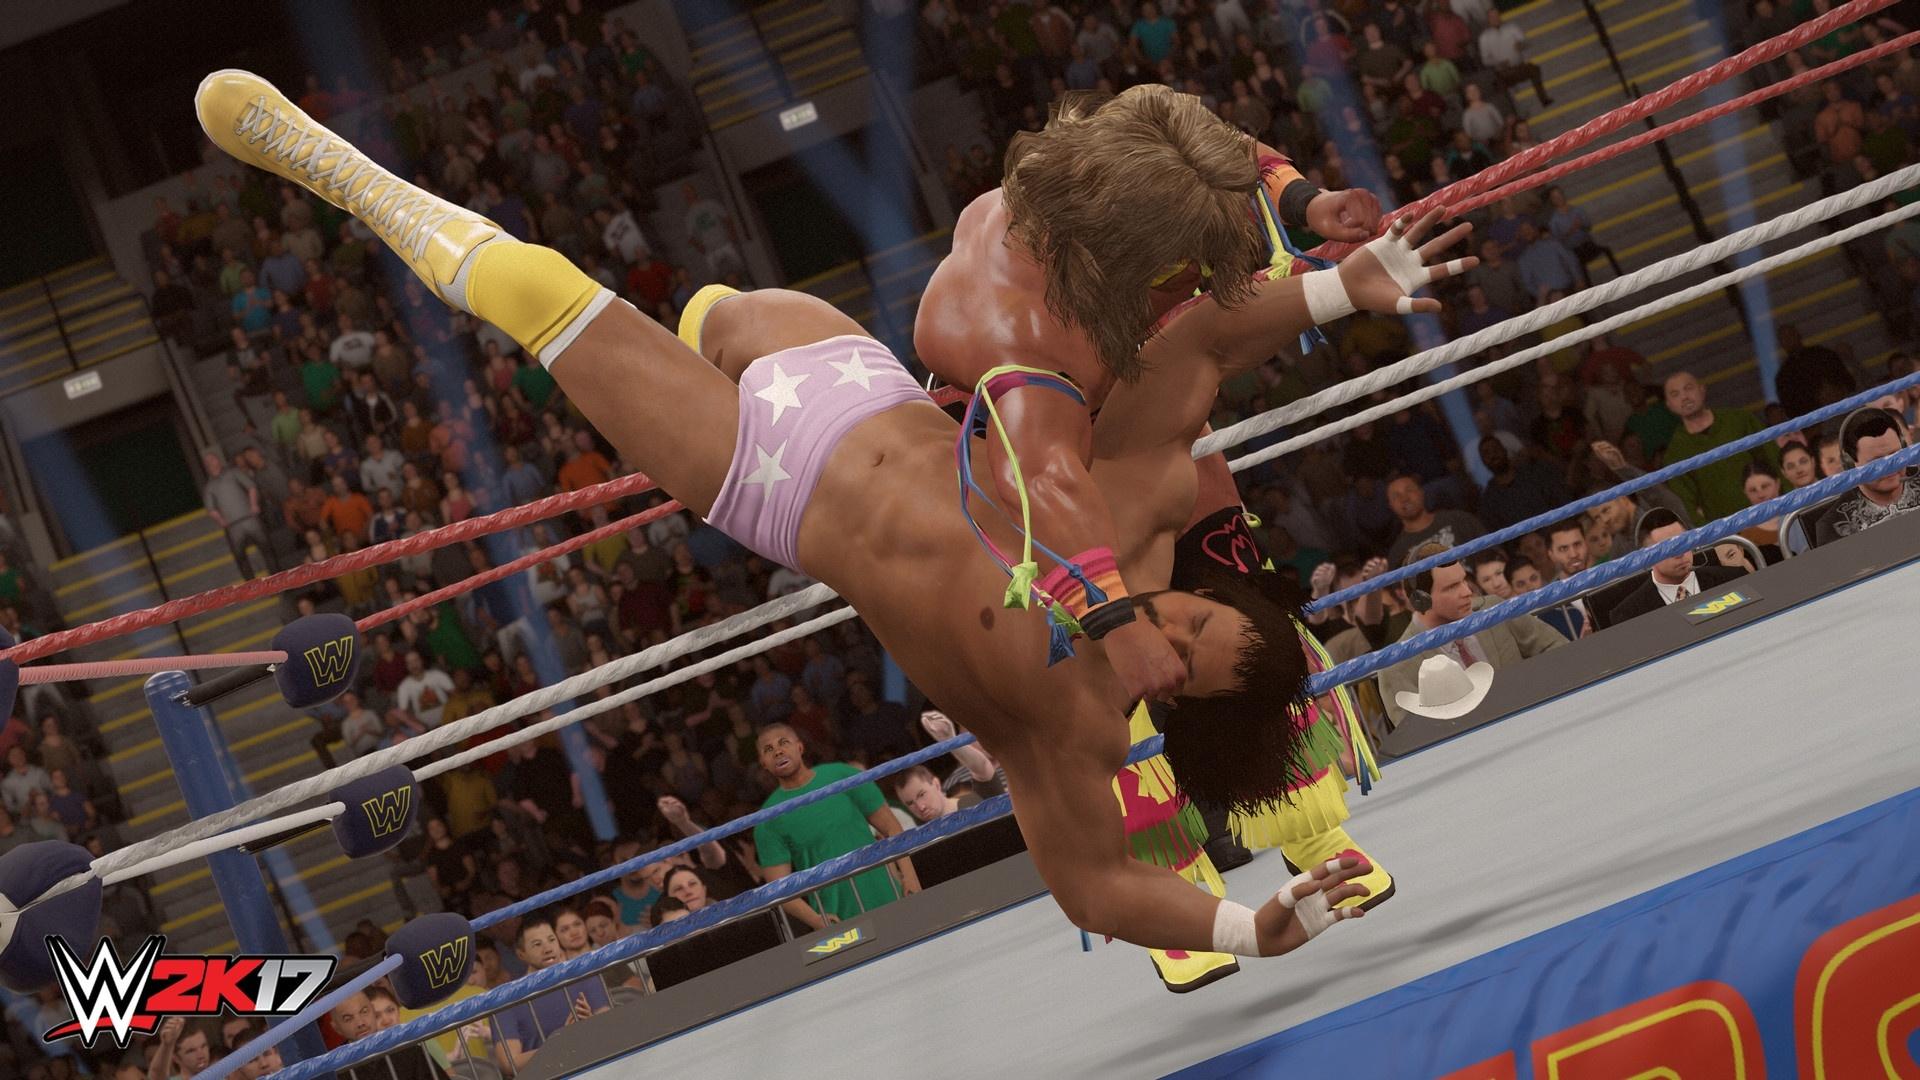 BUY WWE 2K17 Steam CD KEY